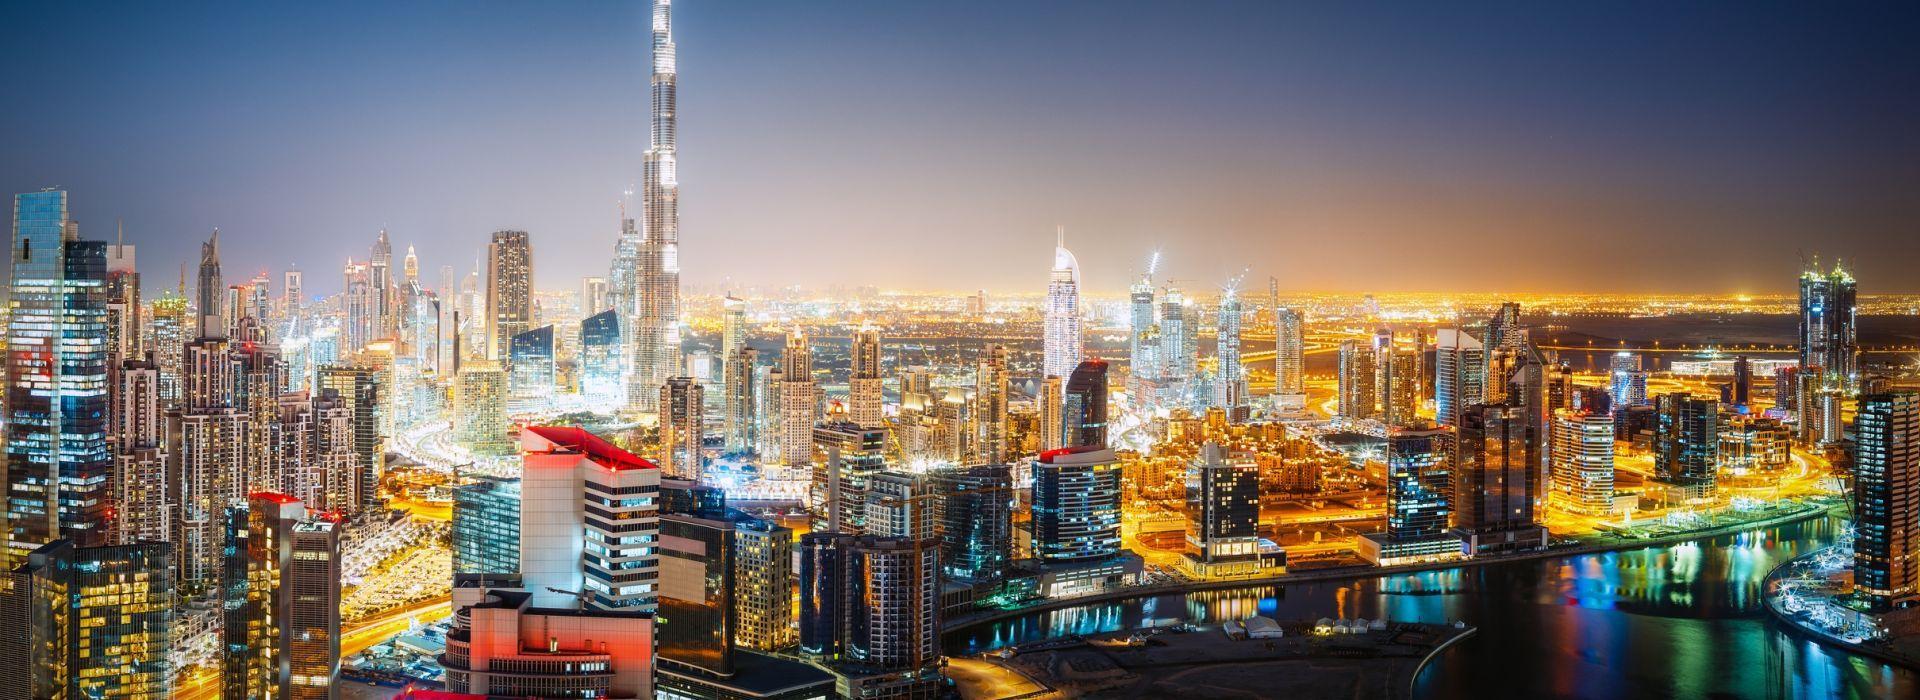 Food tours in UAE